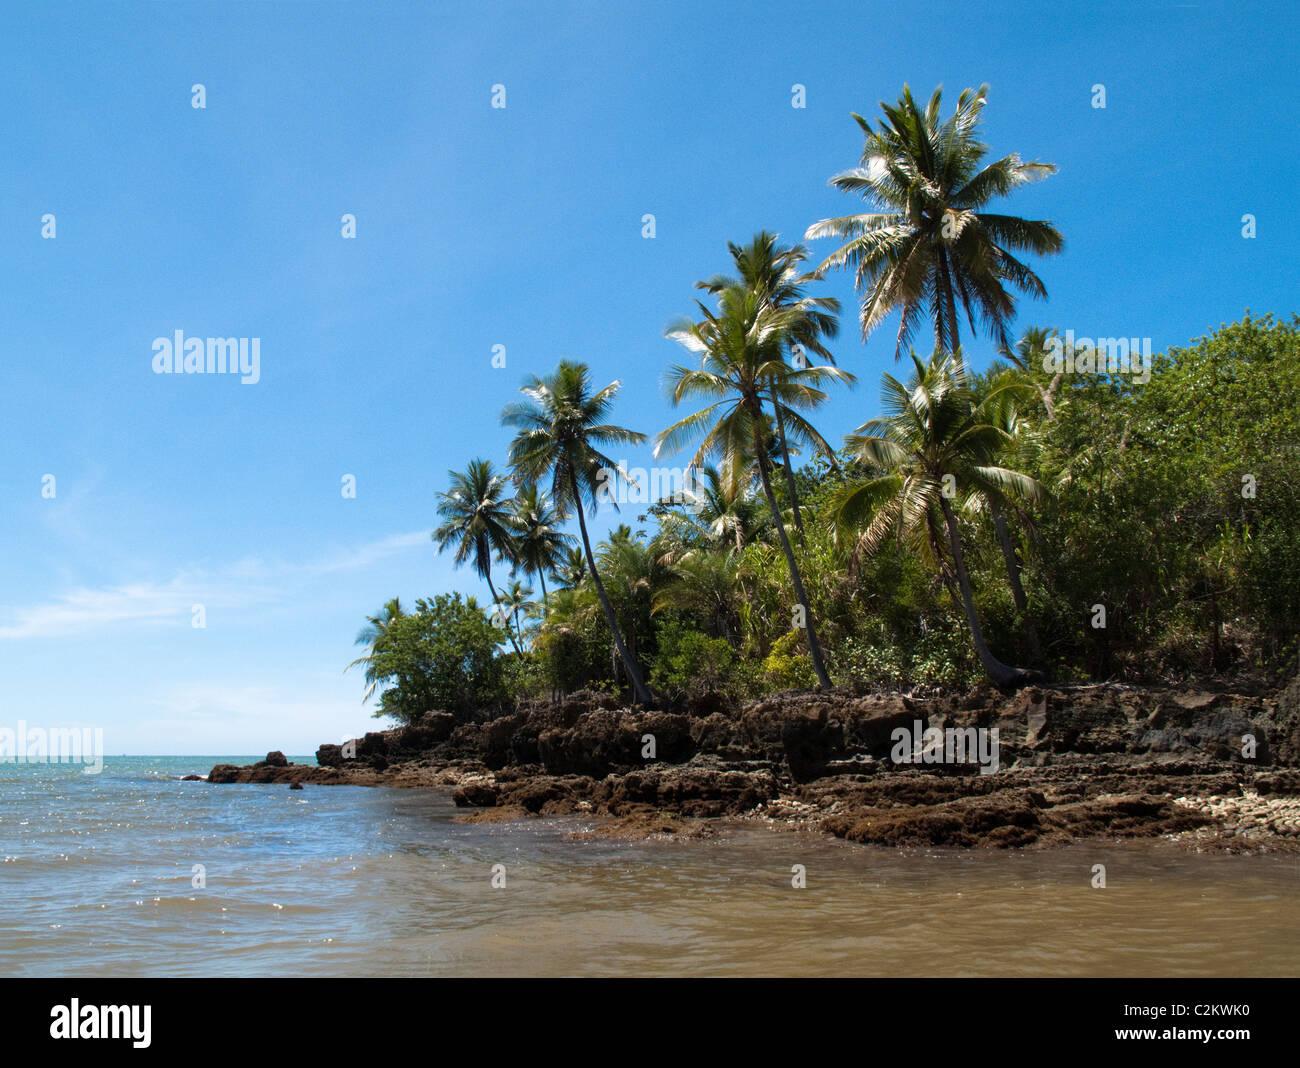 Palm trees on Boipeba Island, Bahia, Brazil Stock Photo